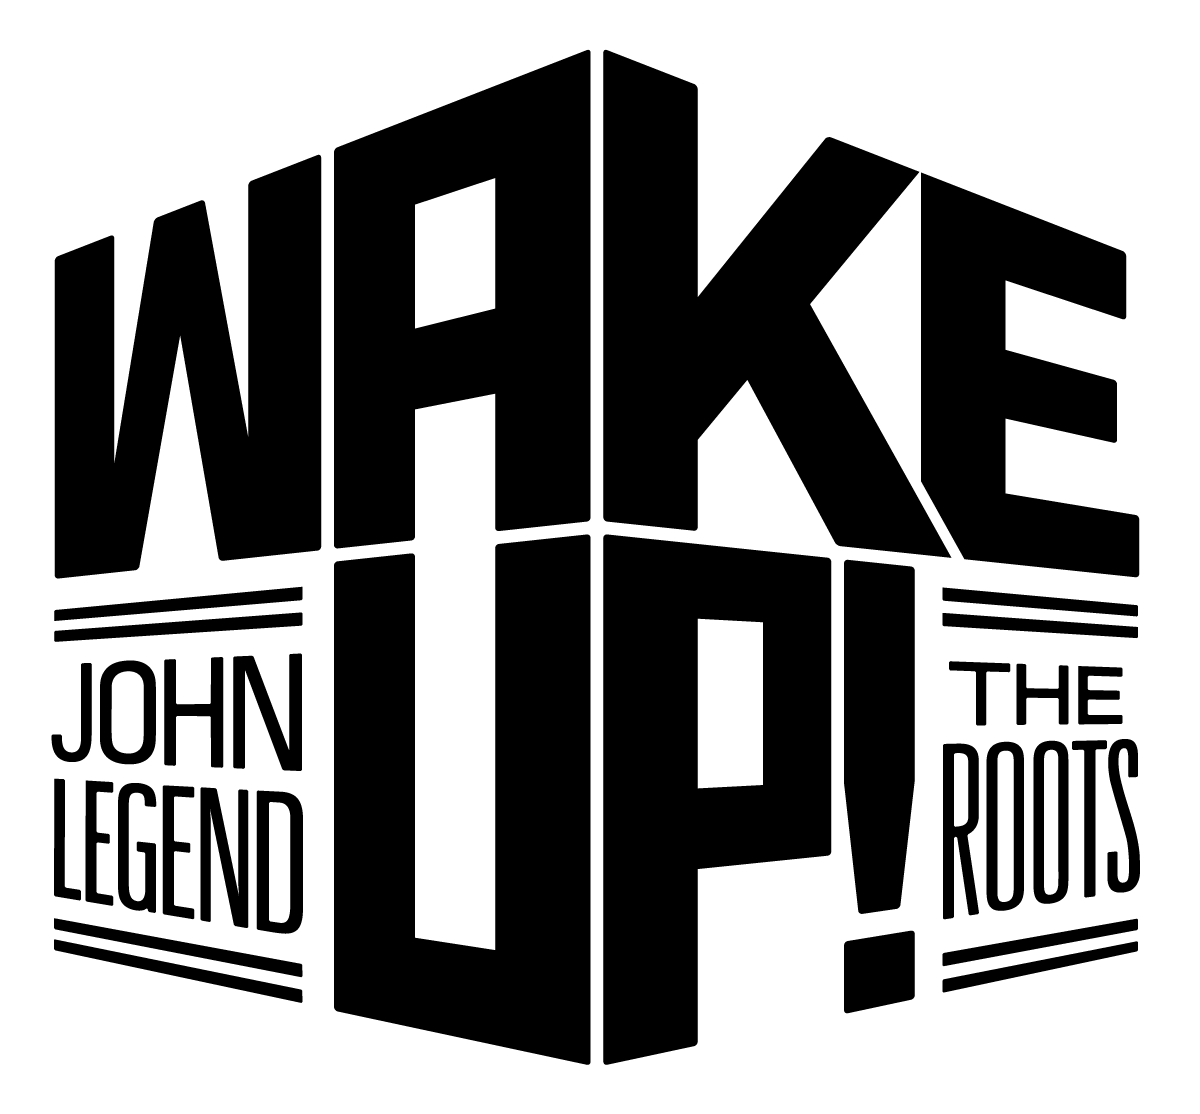 Wake_Up_logo_JohnLegend.png